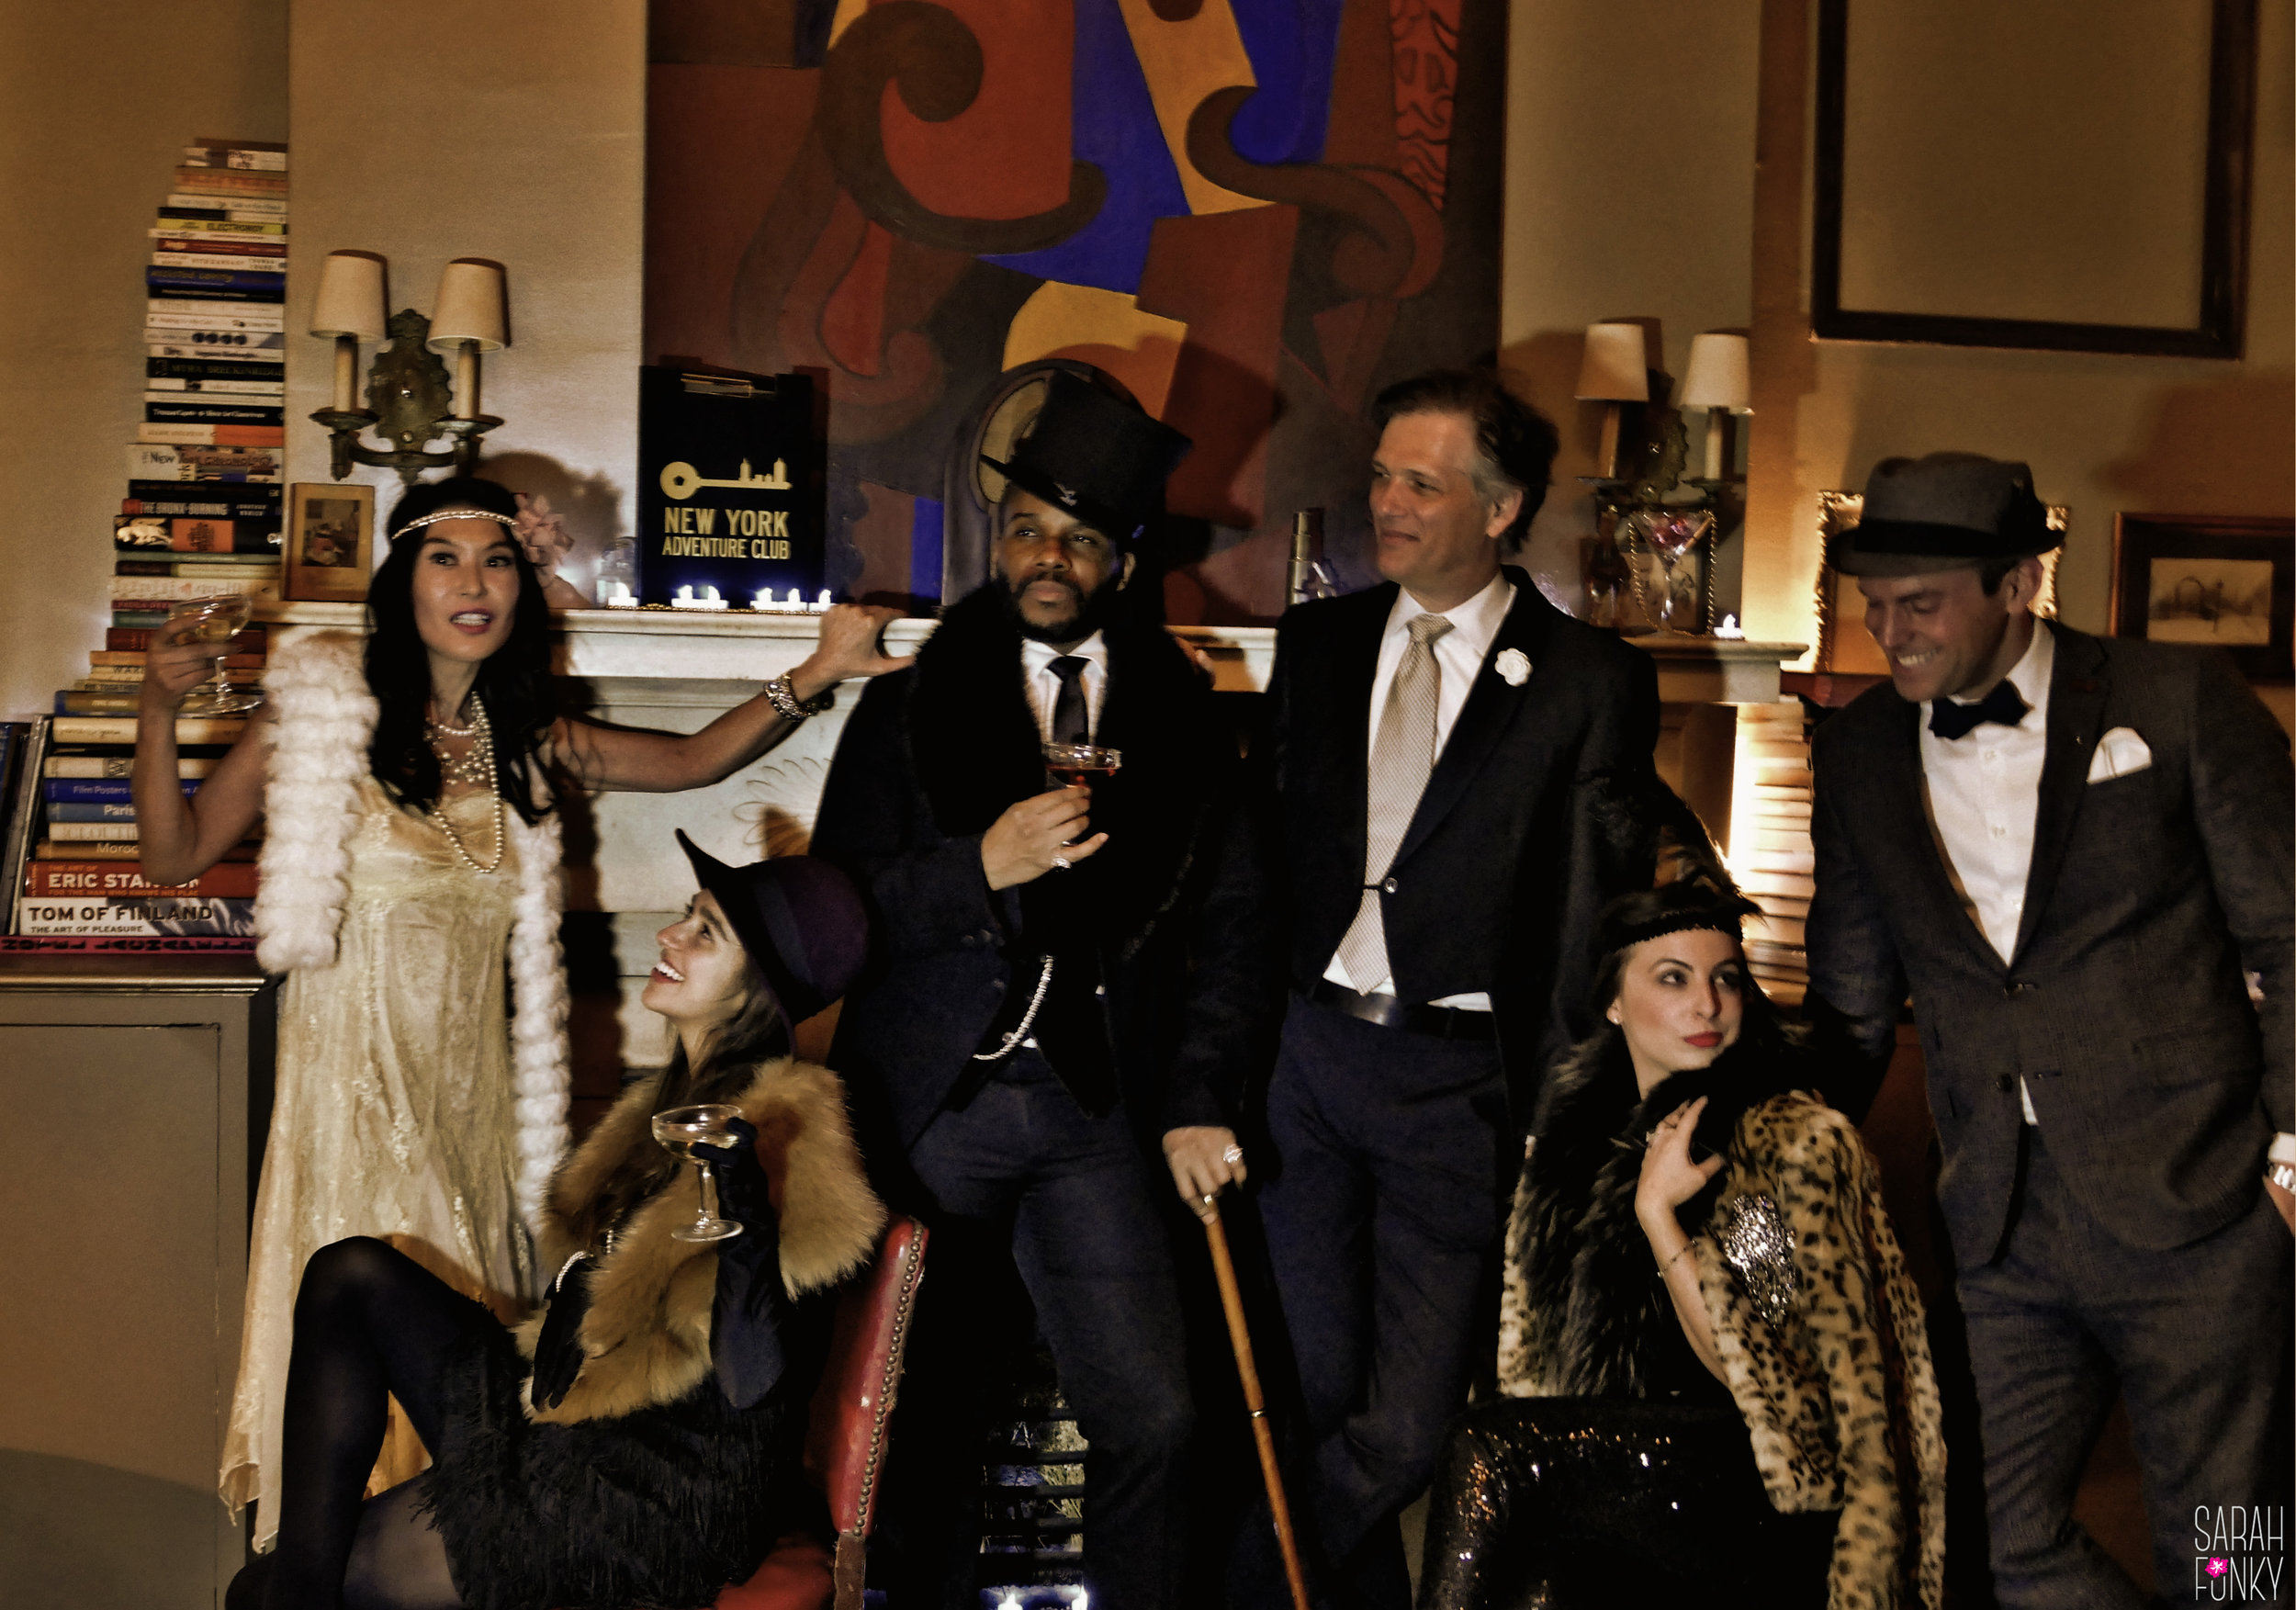 Mimi, Alyssa, Eric, Elon, Heather and John pose for a mid-   soirée photoshoot.